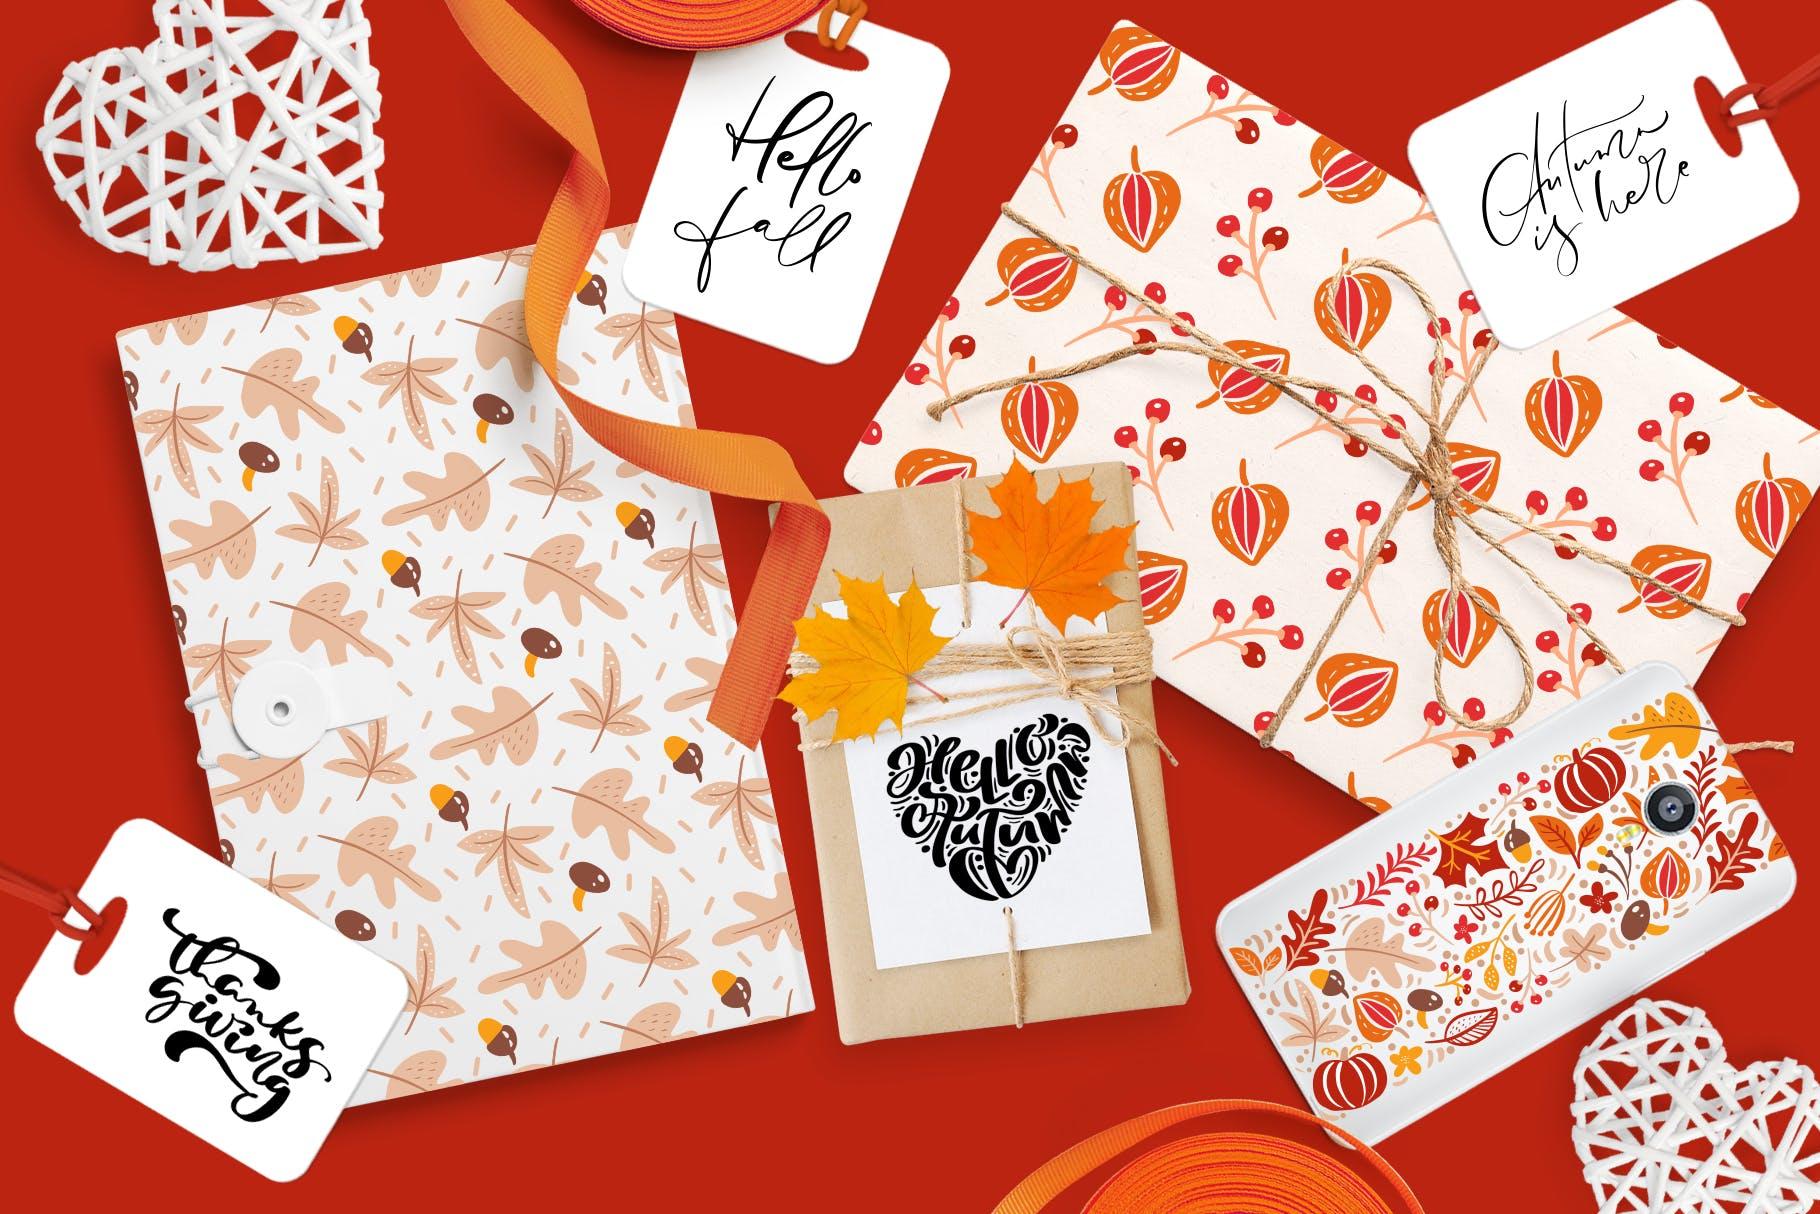 矢量书法和花卉元素图案花纹素材Autumn vector calligraphy floral elements插图(12)